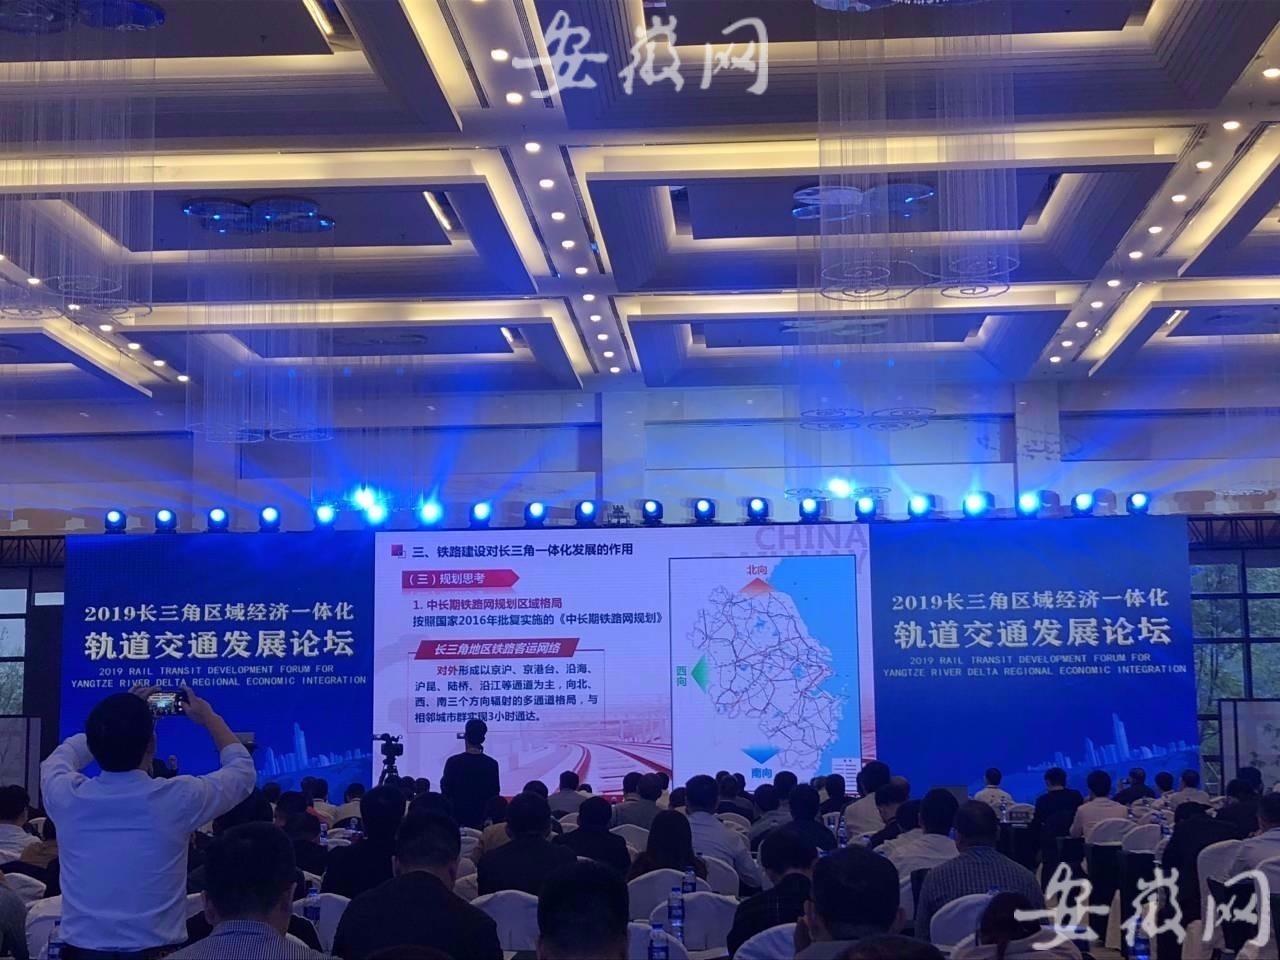 http://www.edaojz.cn/youxijingji/299498.html